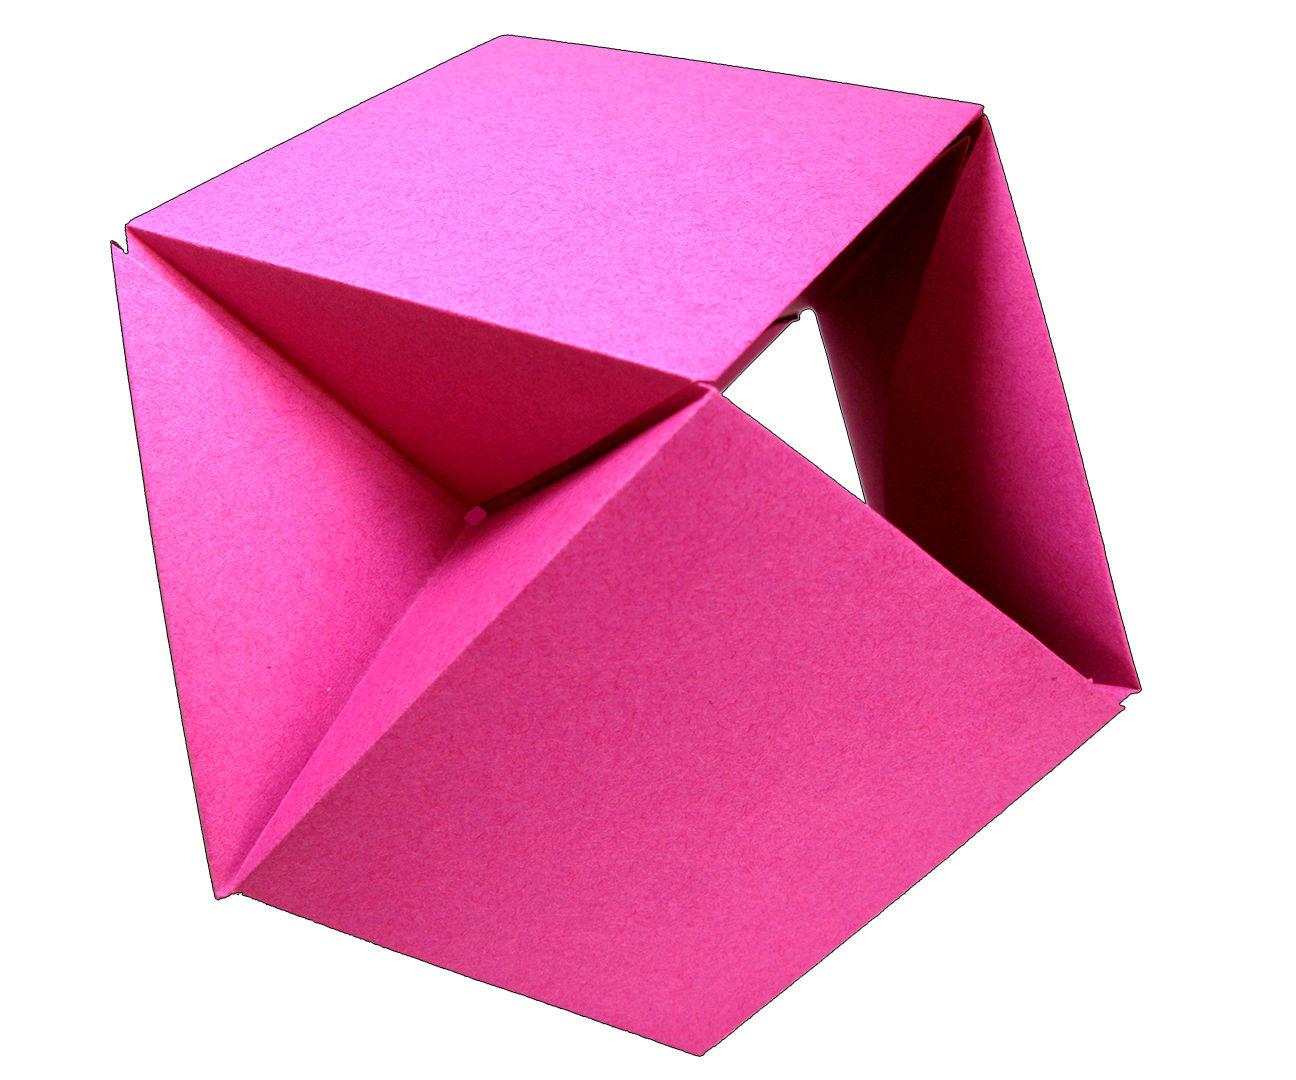 Modular Origami Ball Tutorial - 6 Units